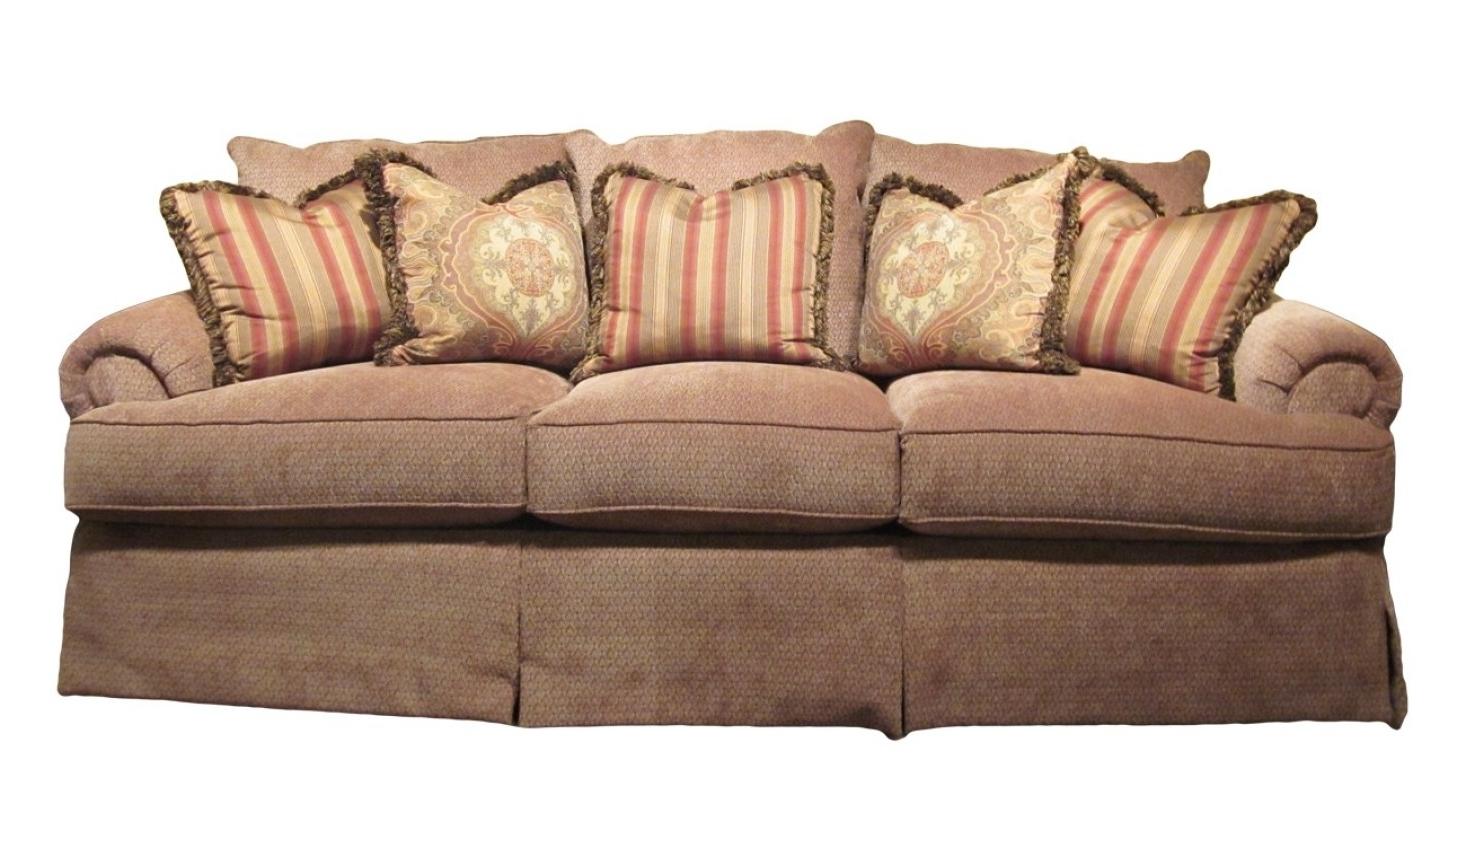 Favorite Cindy Crawford Sofas Pertaining To Sofas Center Cindy Crawford Sectional Metropolis Sofa Sleeper (View 15 of 20)